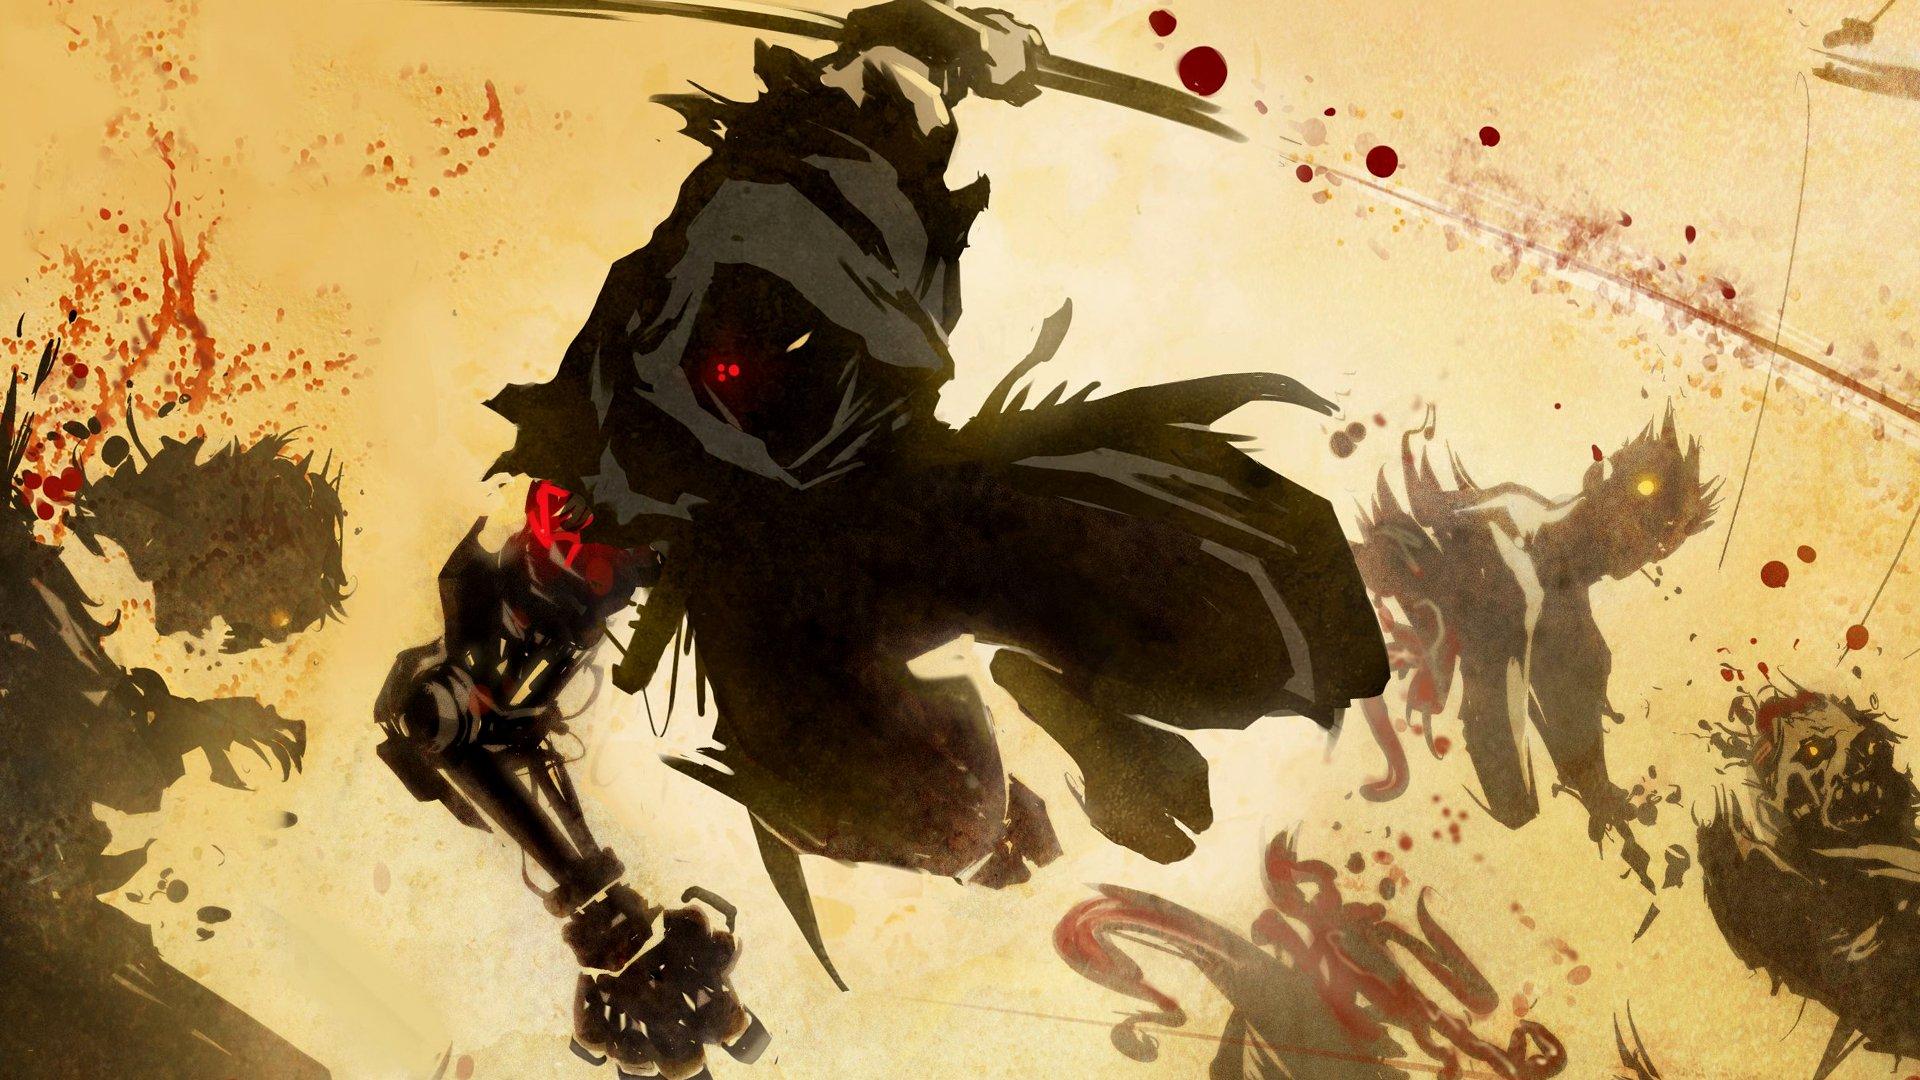 Cat Girl Fighter Wallpaper 1080x1920 Yaiba Ninja Gaiden Z Full Hd Wallpaper And Background